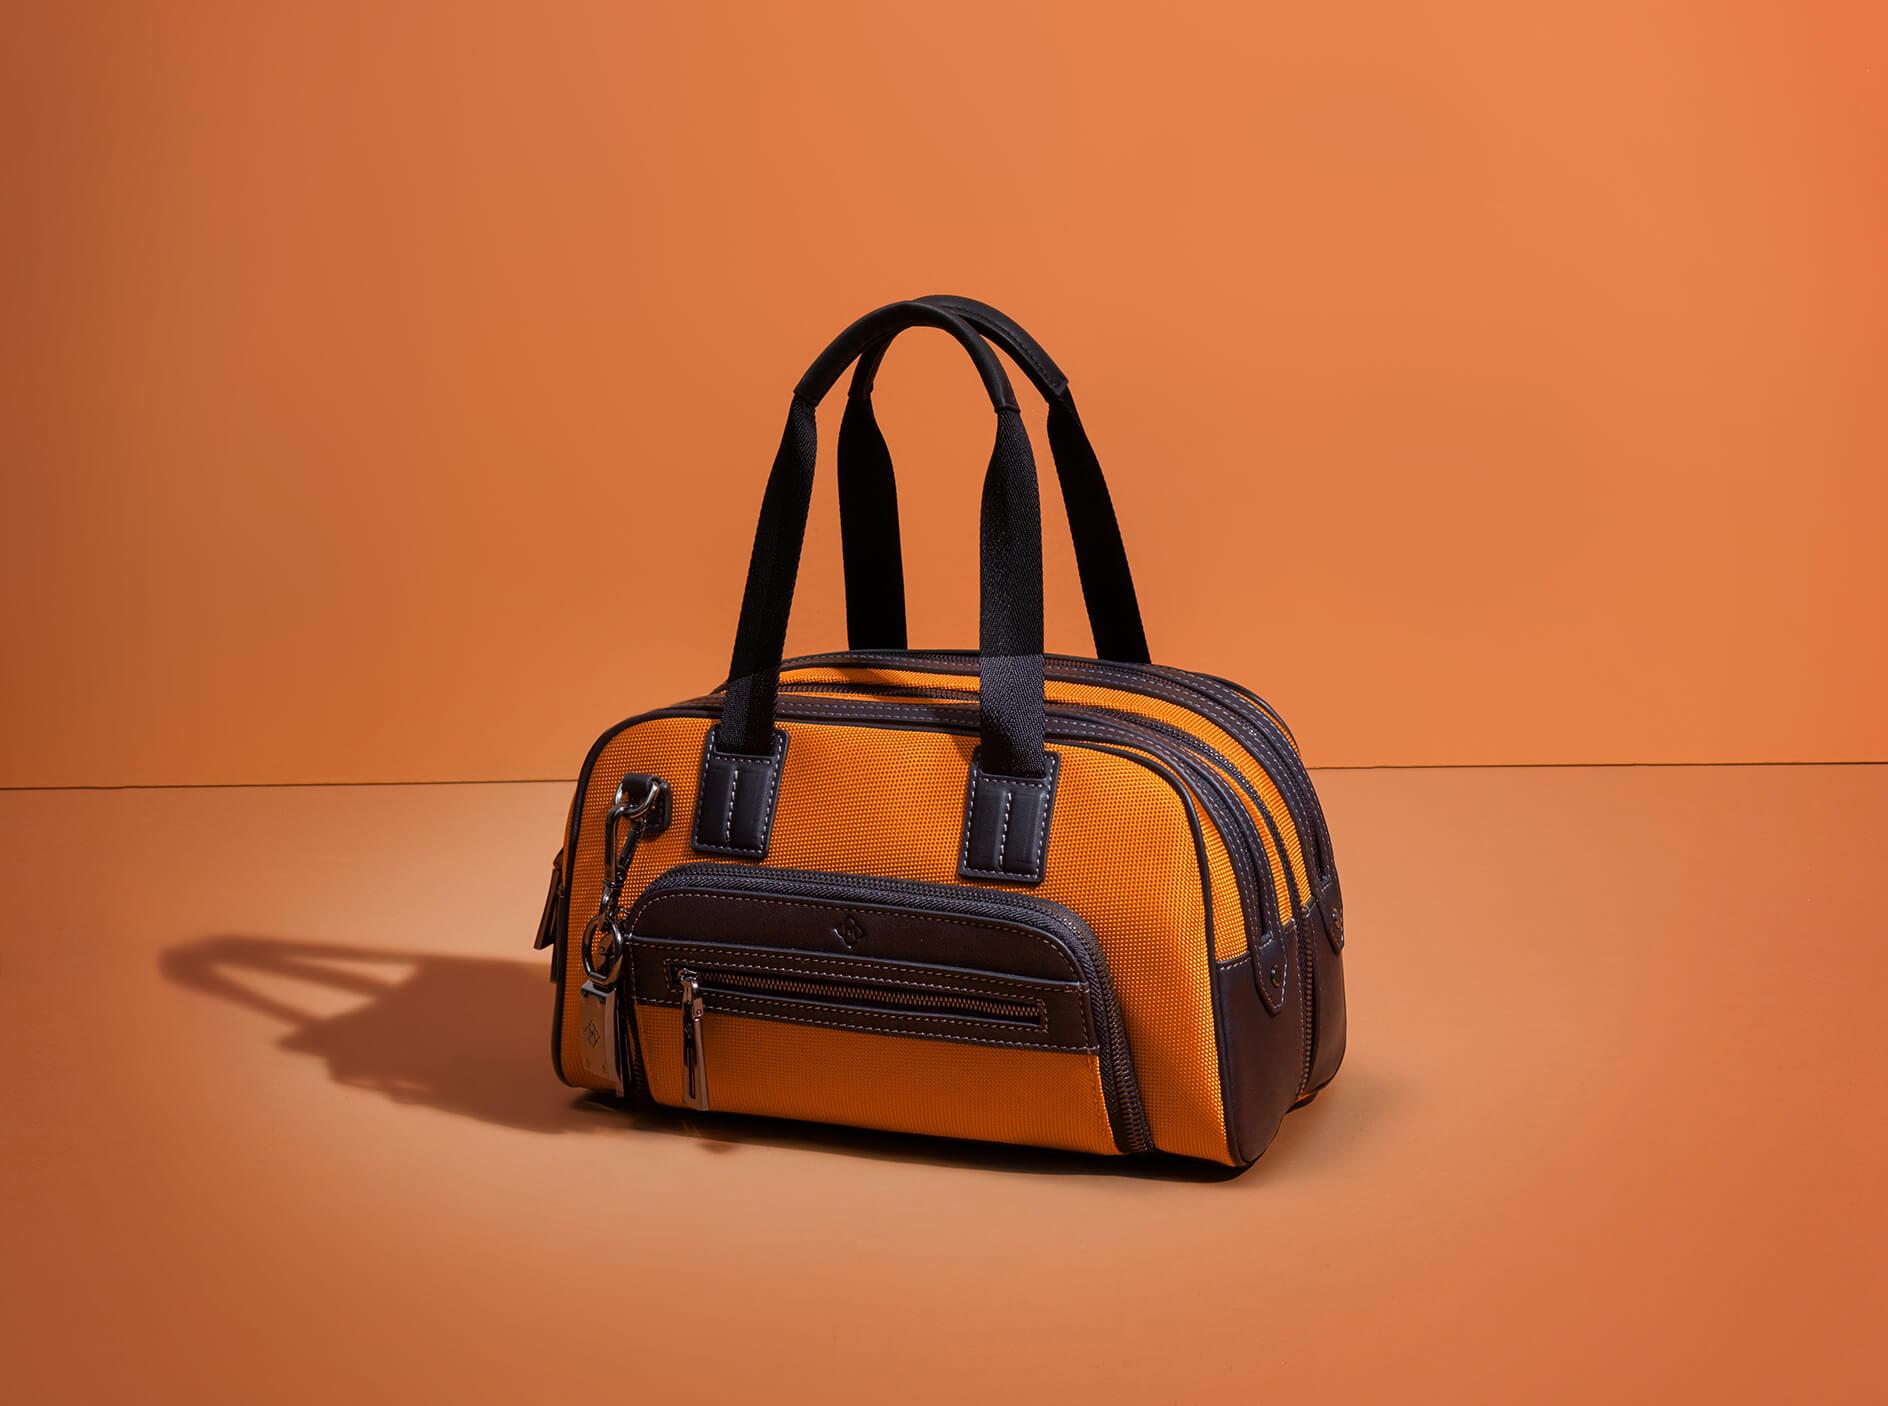 Orange Travel Bag